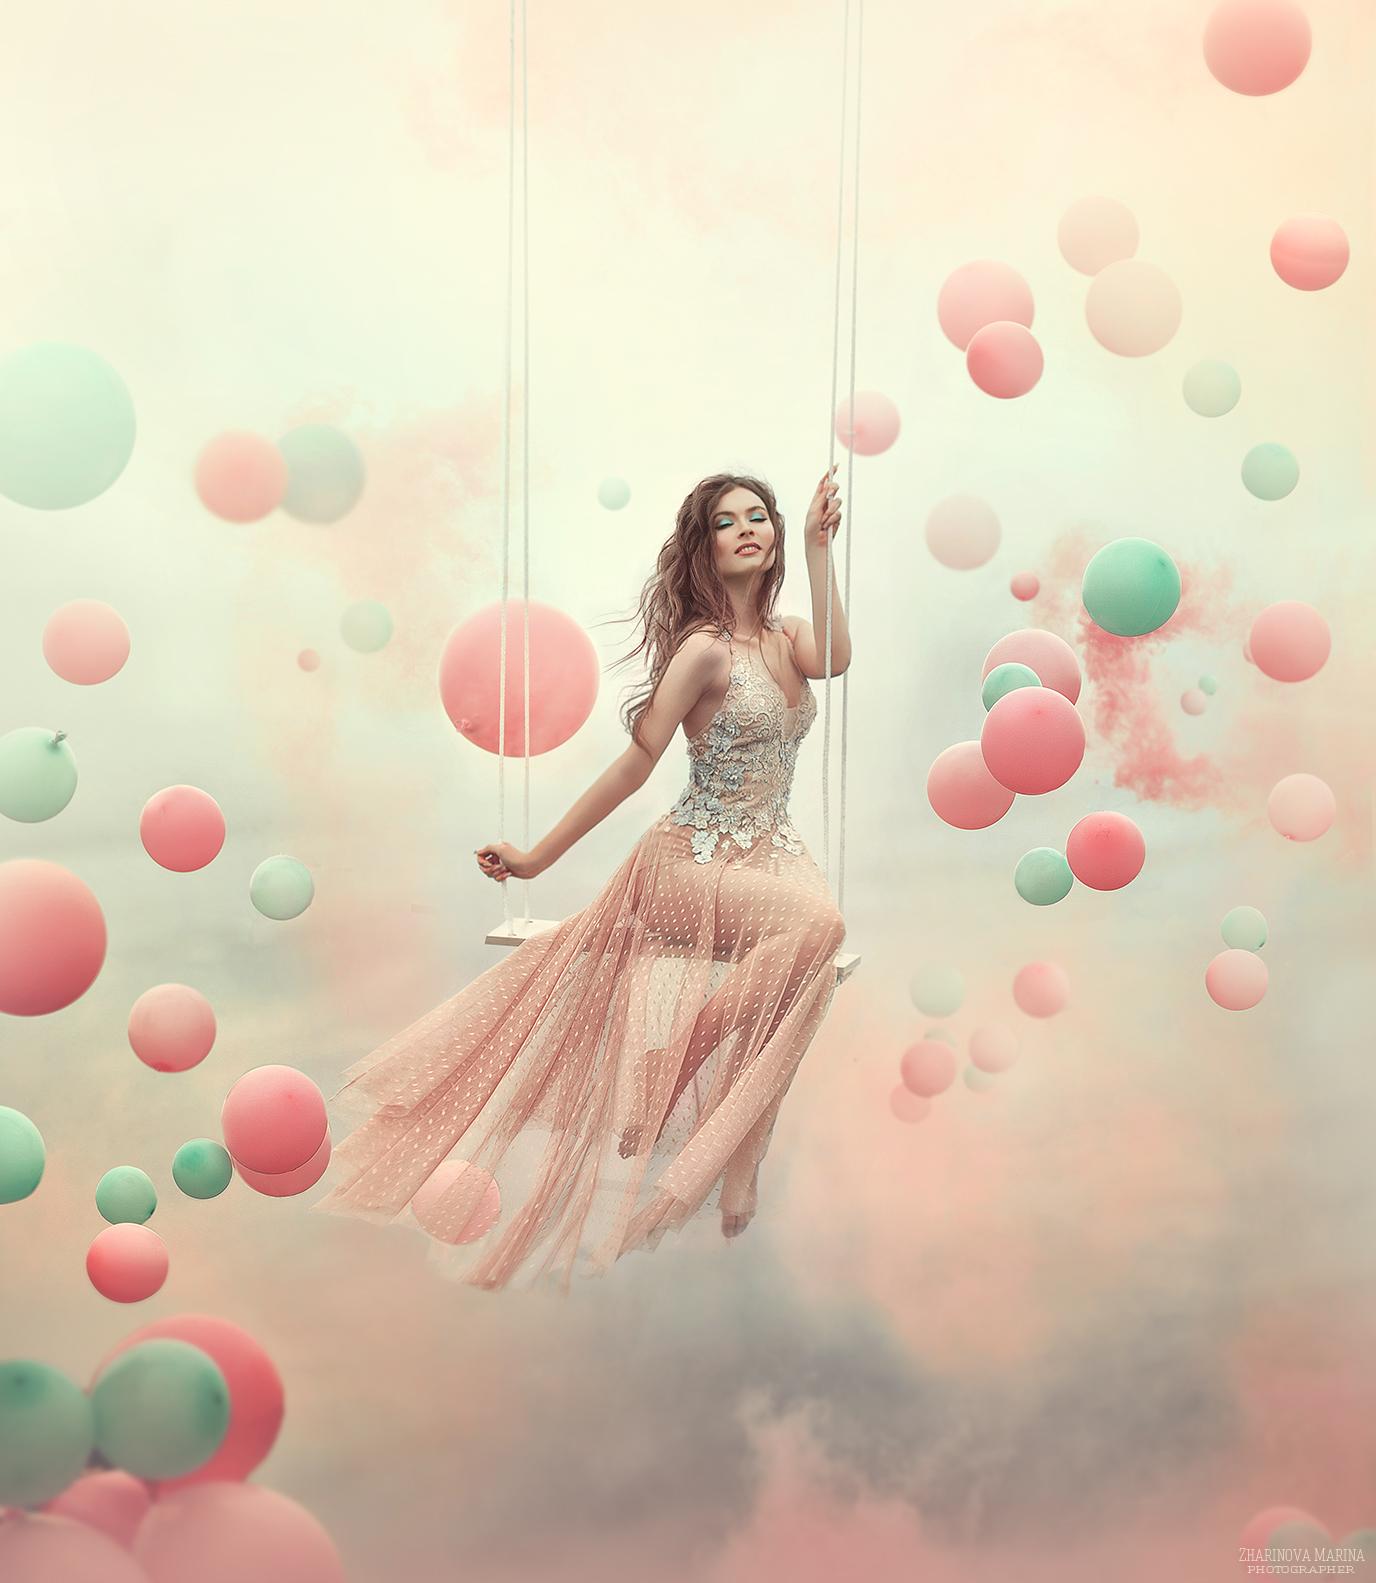 Картинки девушек с шарами